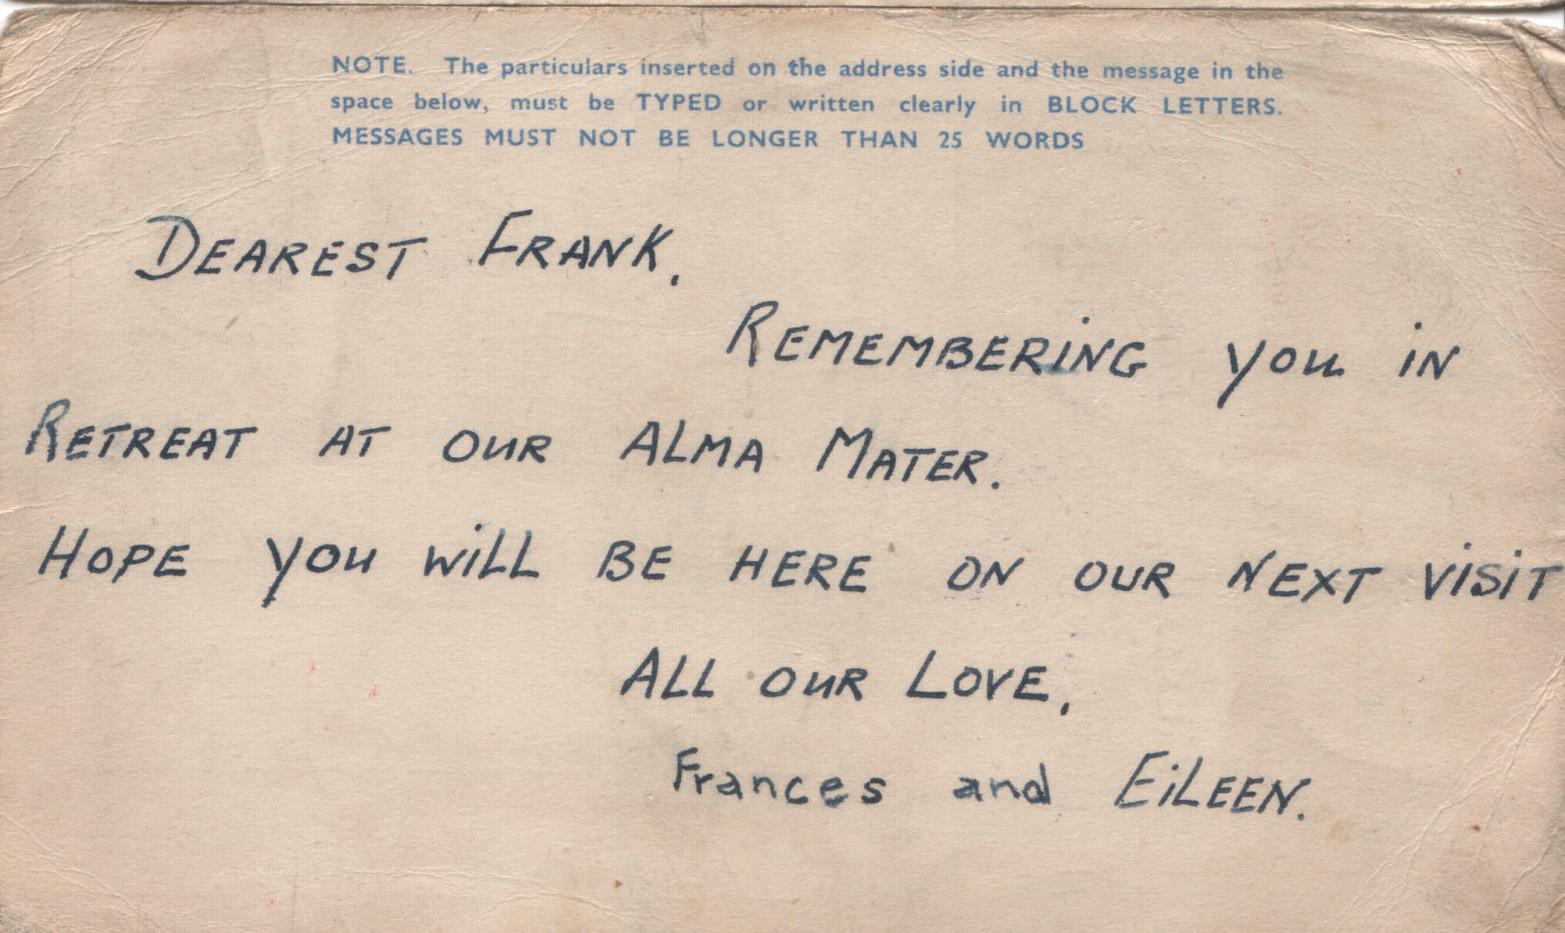 1944.07.02. Frances & Eileen